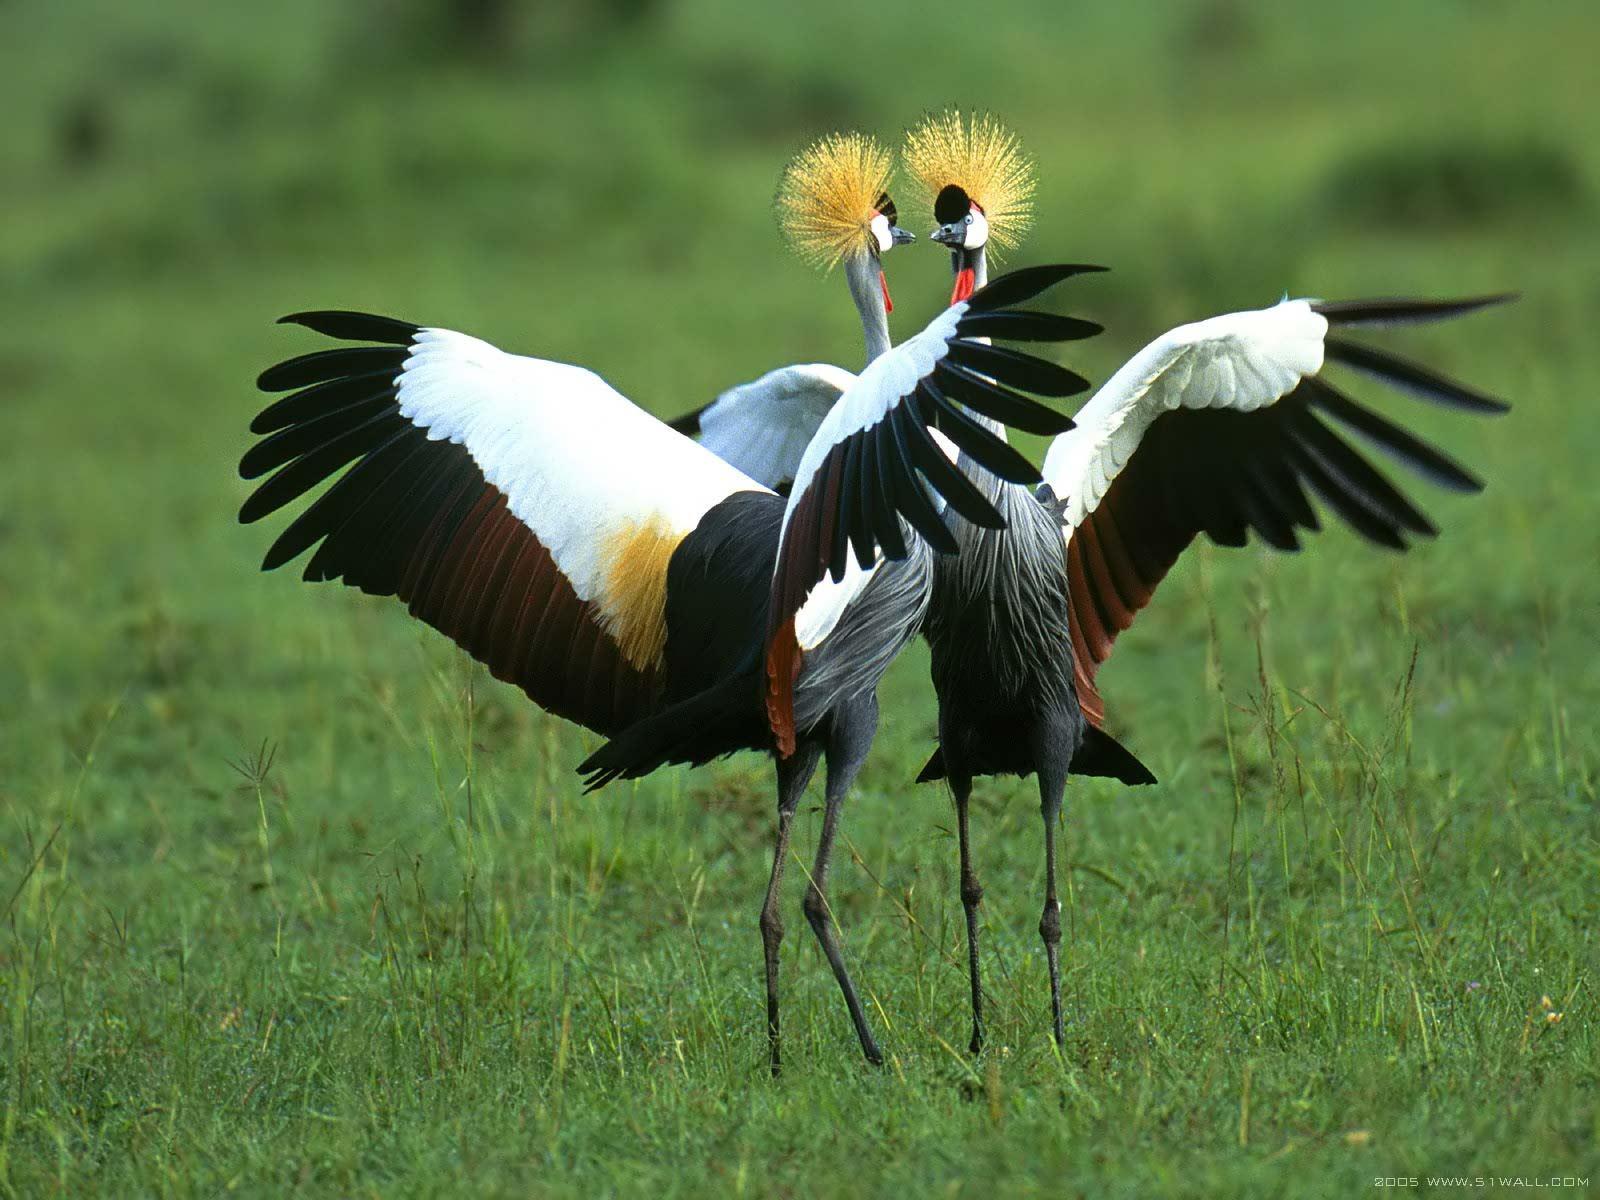 natural captured and interesting animals pictures for desktop